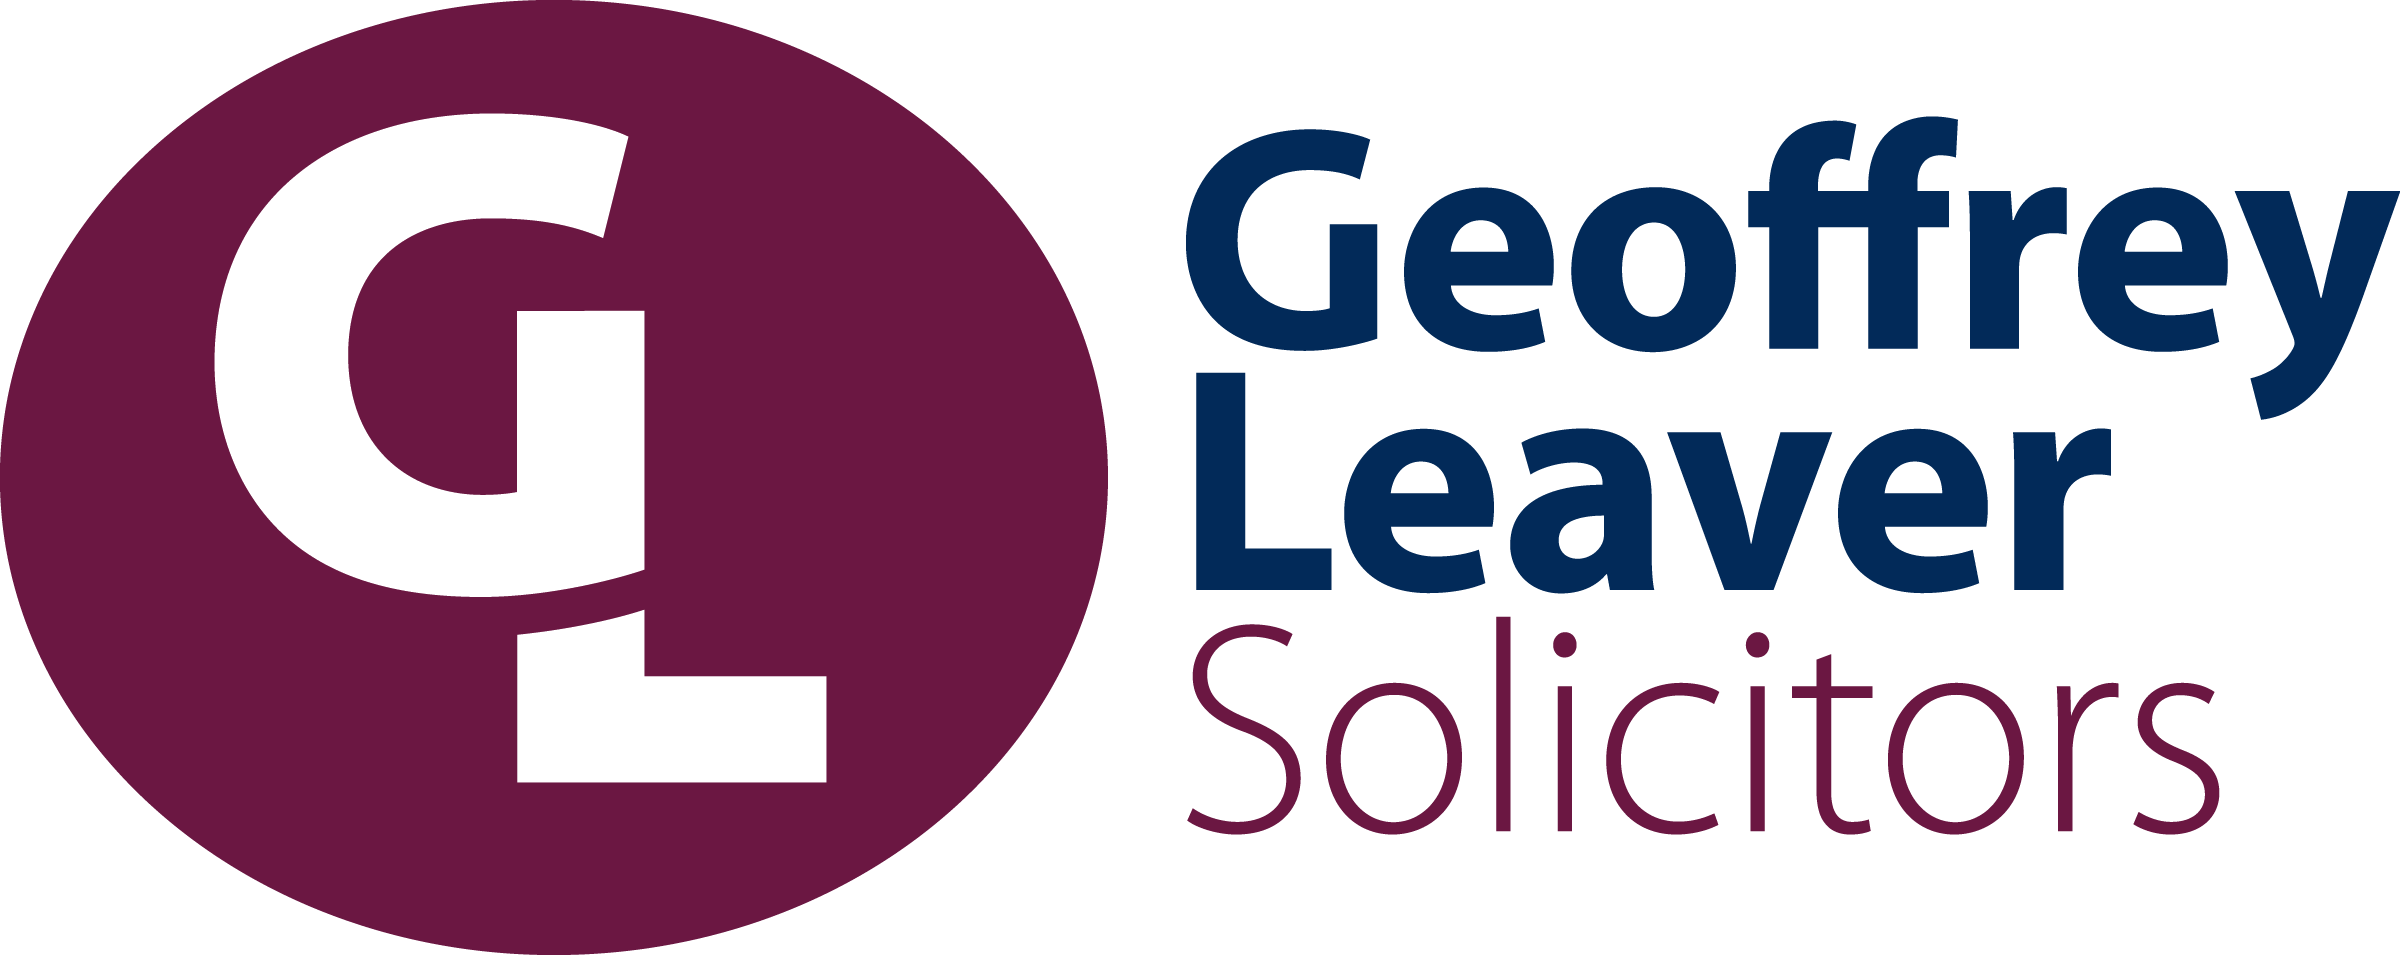 Geoffrey Leaver Solicitors